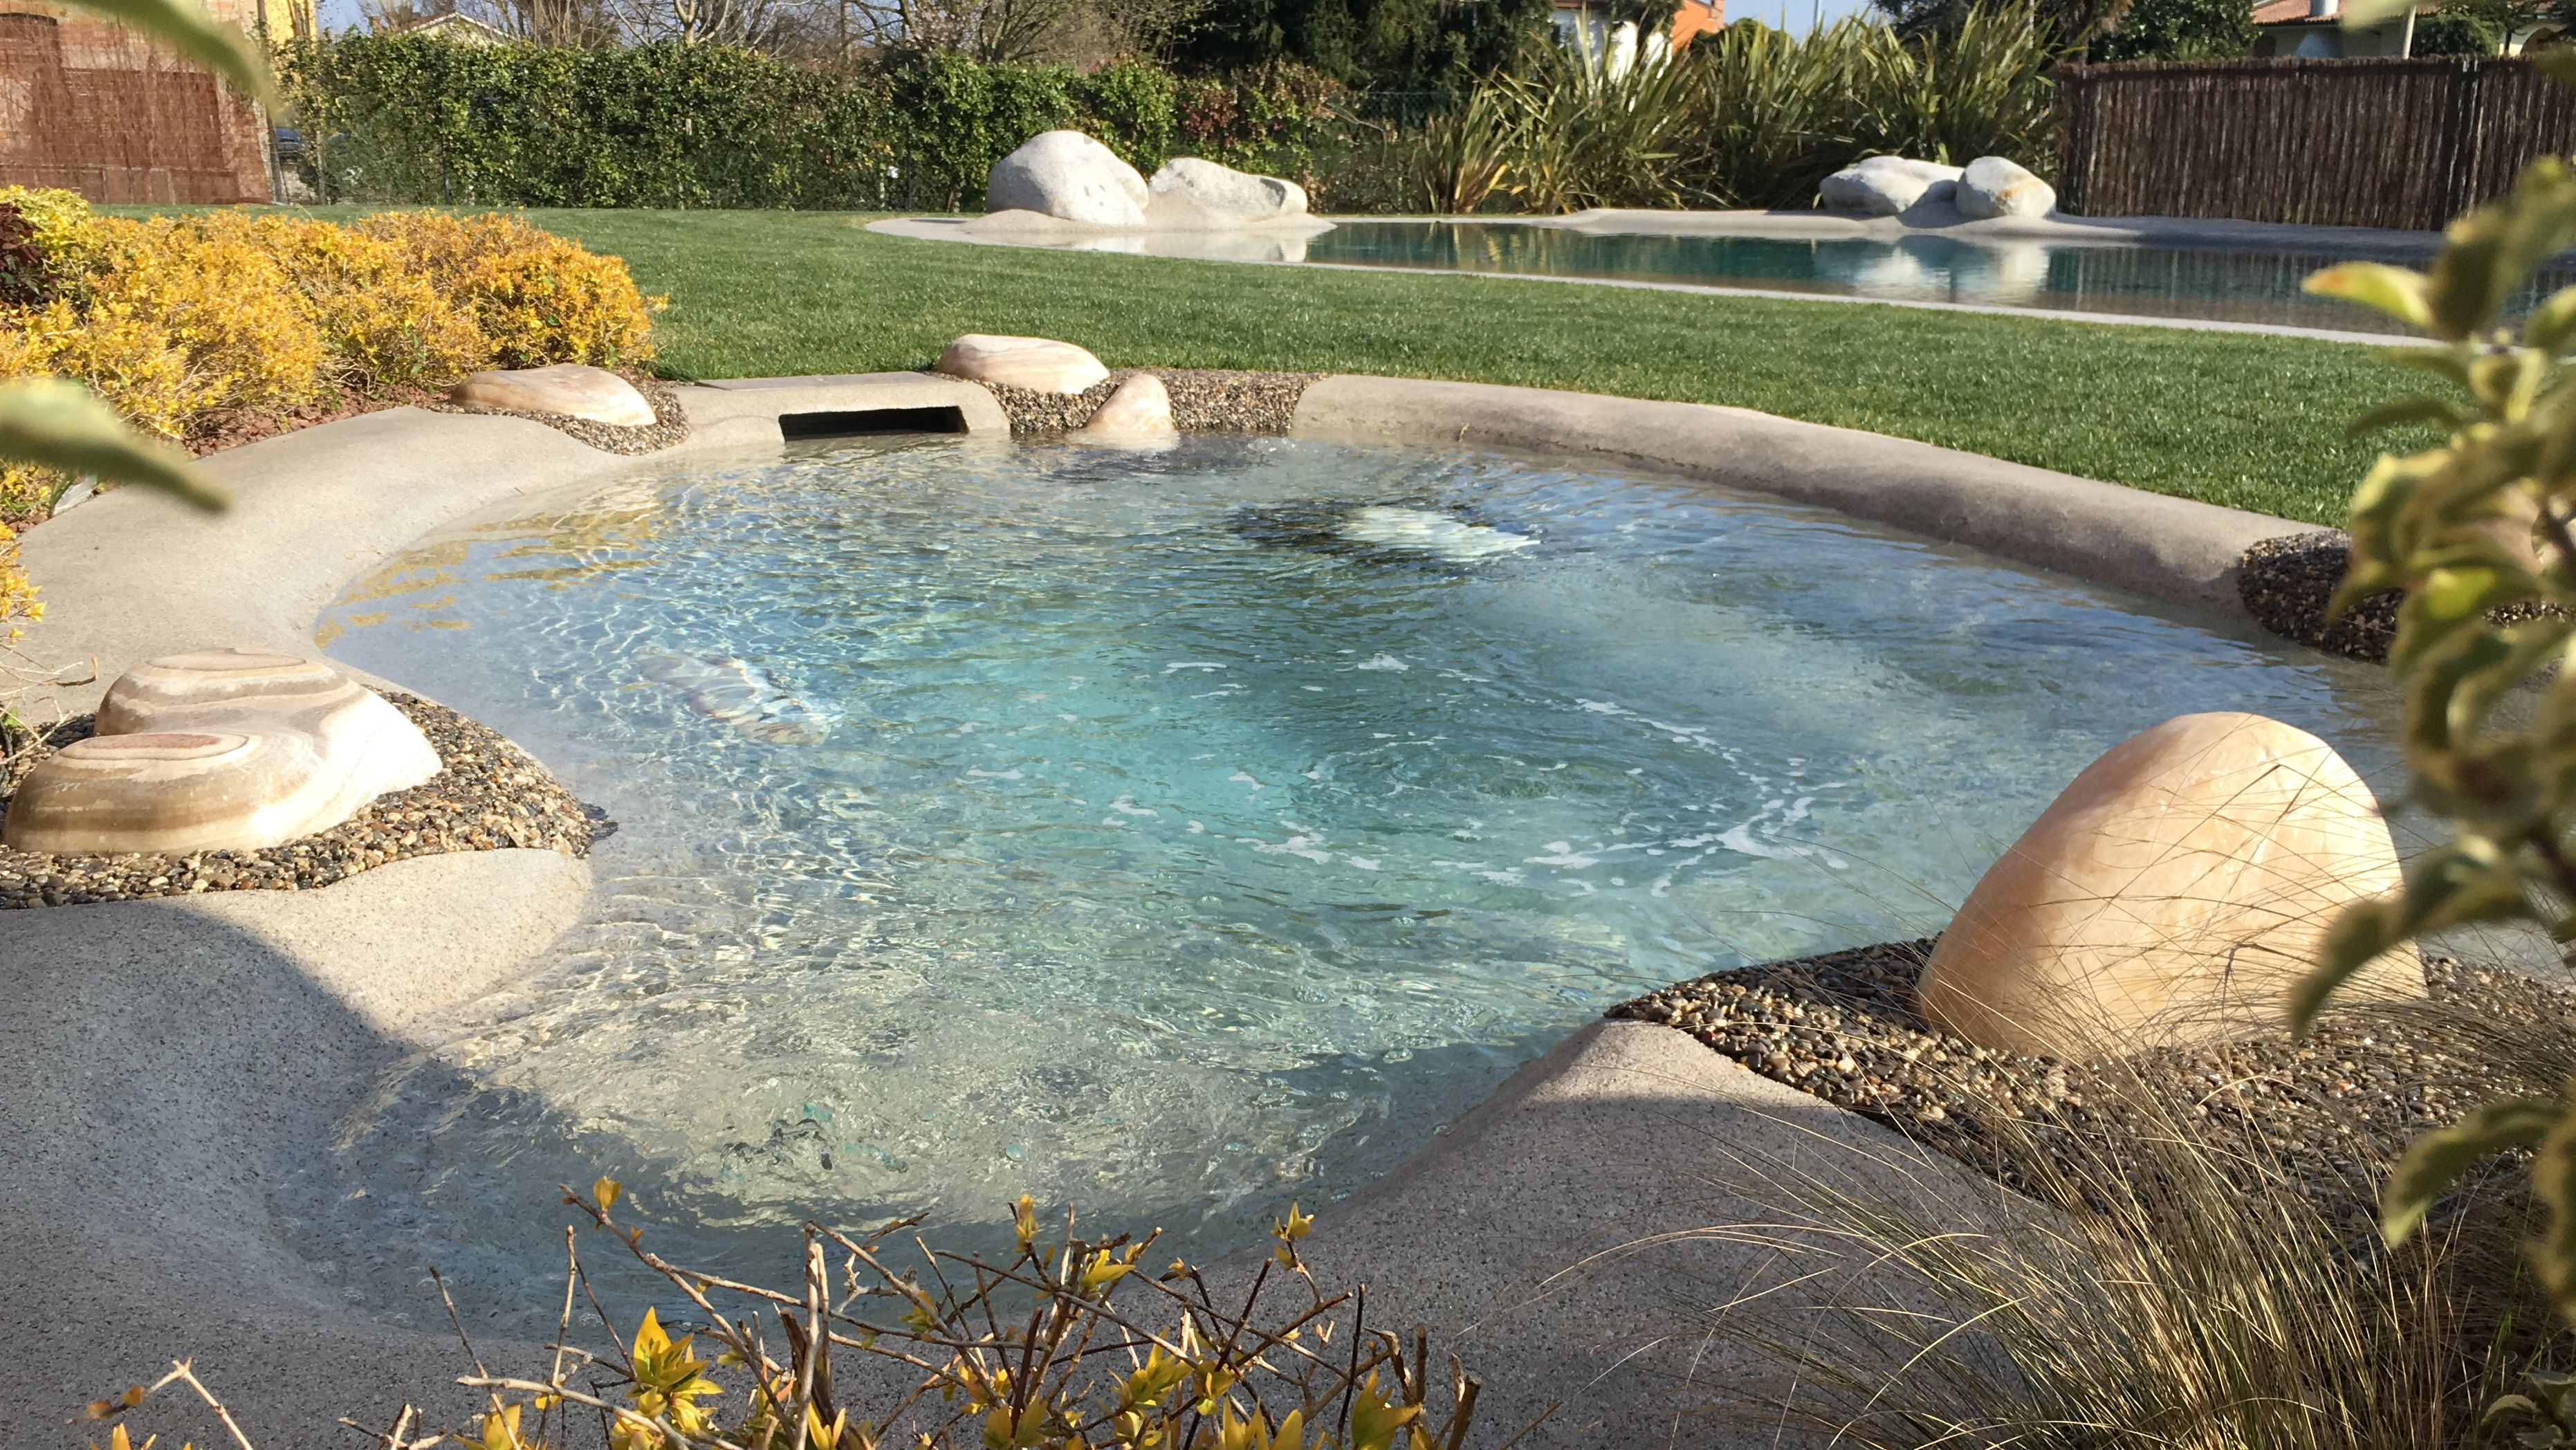 Pin By Leona On Pool2 Backyard Pool Backyard Beach Plunge Pool Diy backyard beach pool